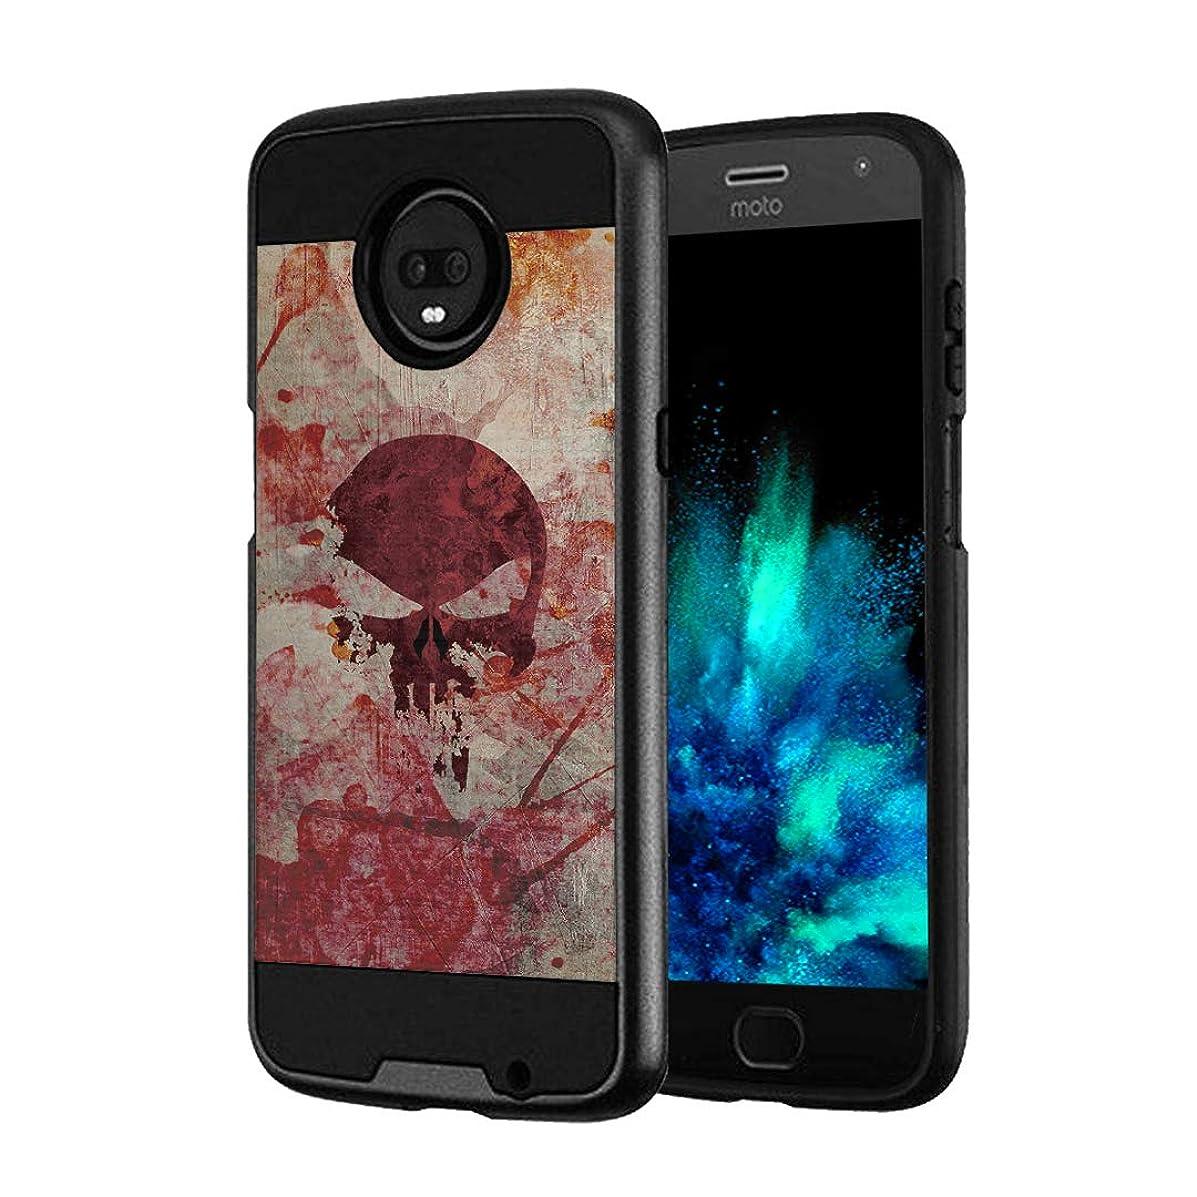 Capsule Case Compatible with Moto Z3, Moto Z3 Play (2018) [Hybrid Fusion Dual Layer Slick Armor Case Black] for Motorola Moto Z3 - (Red Skull)